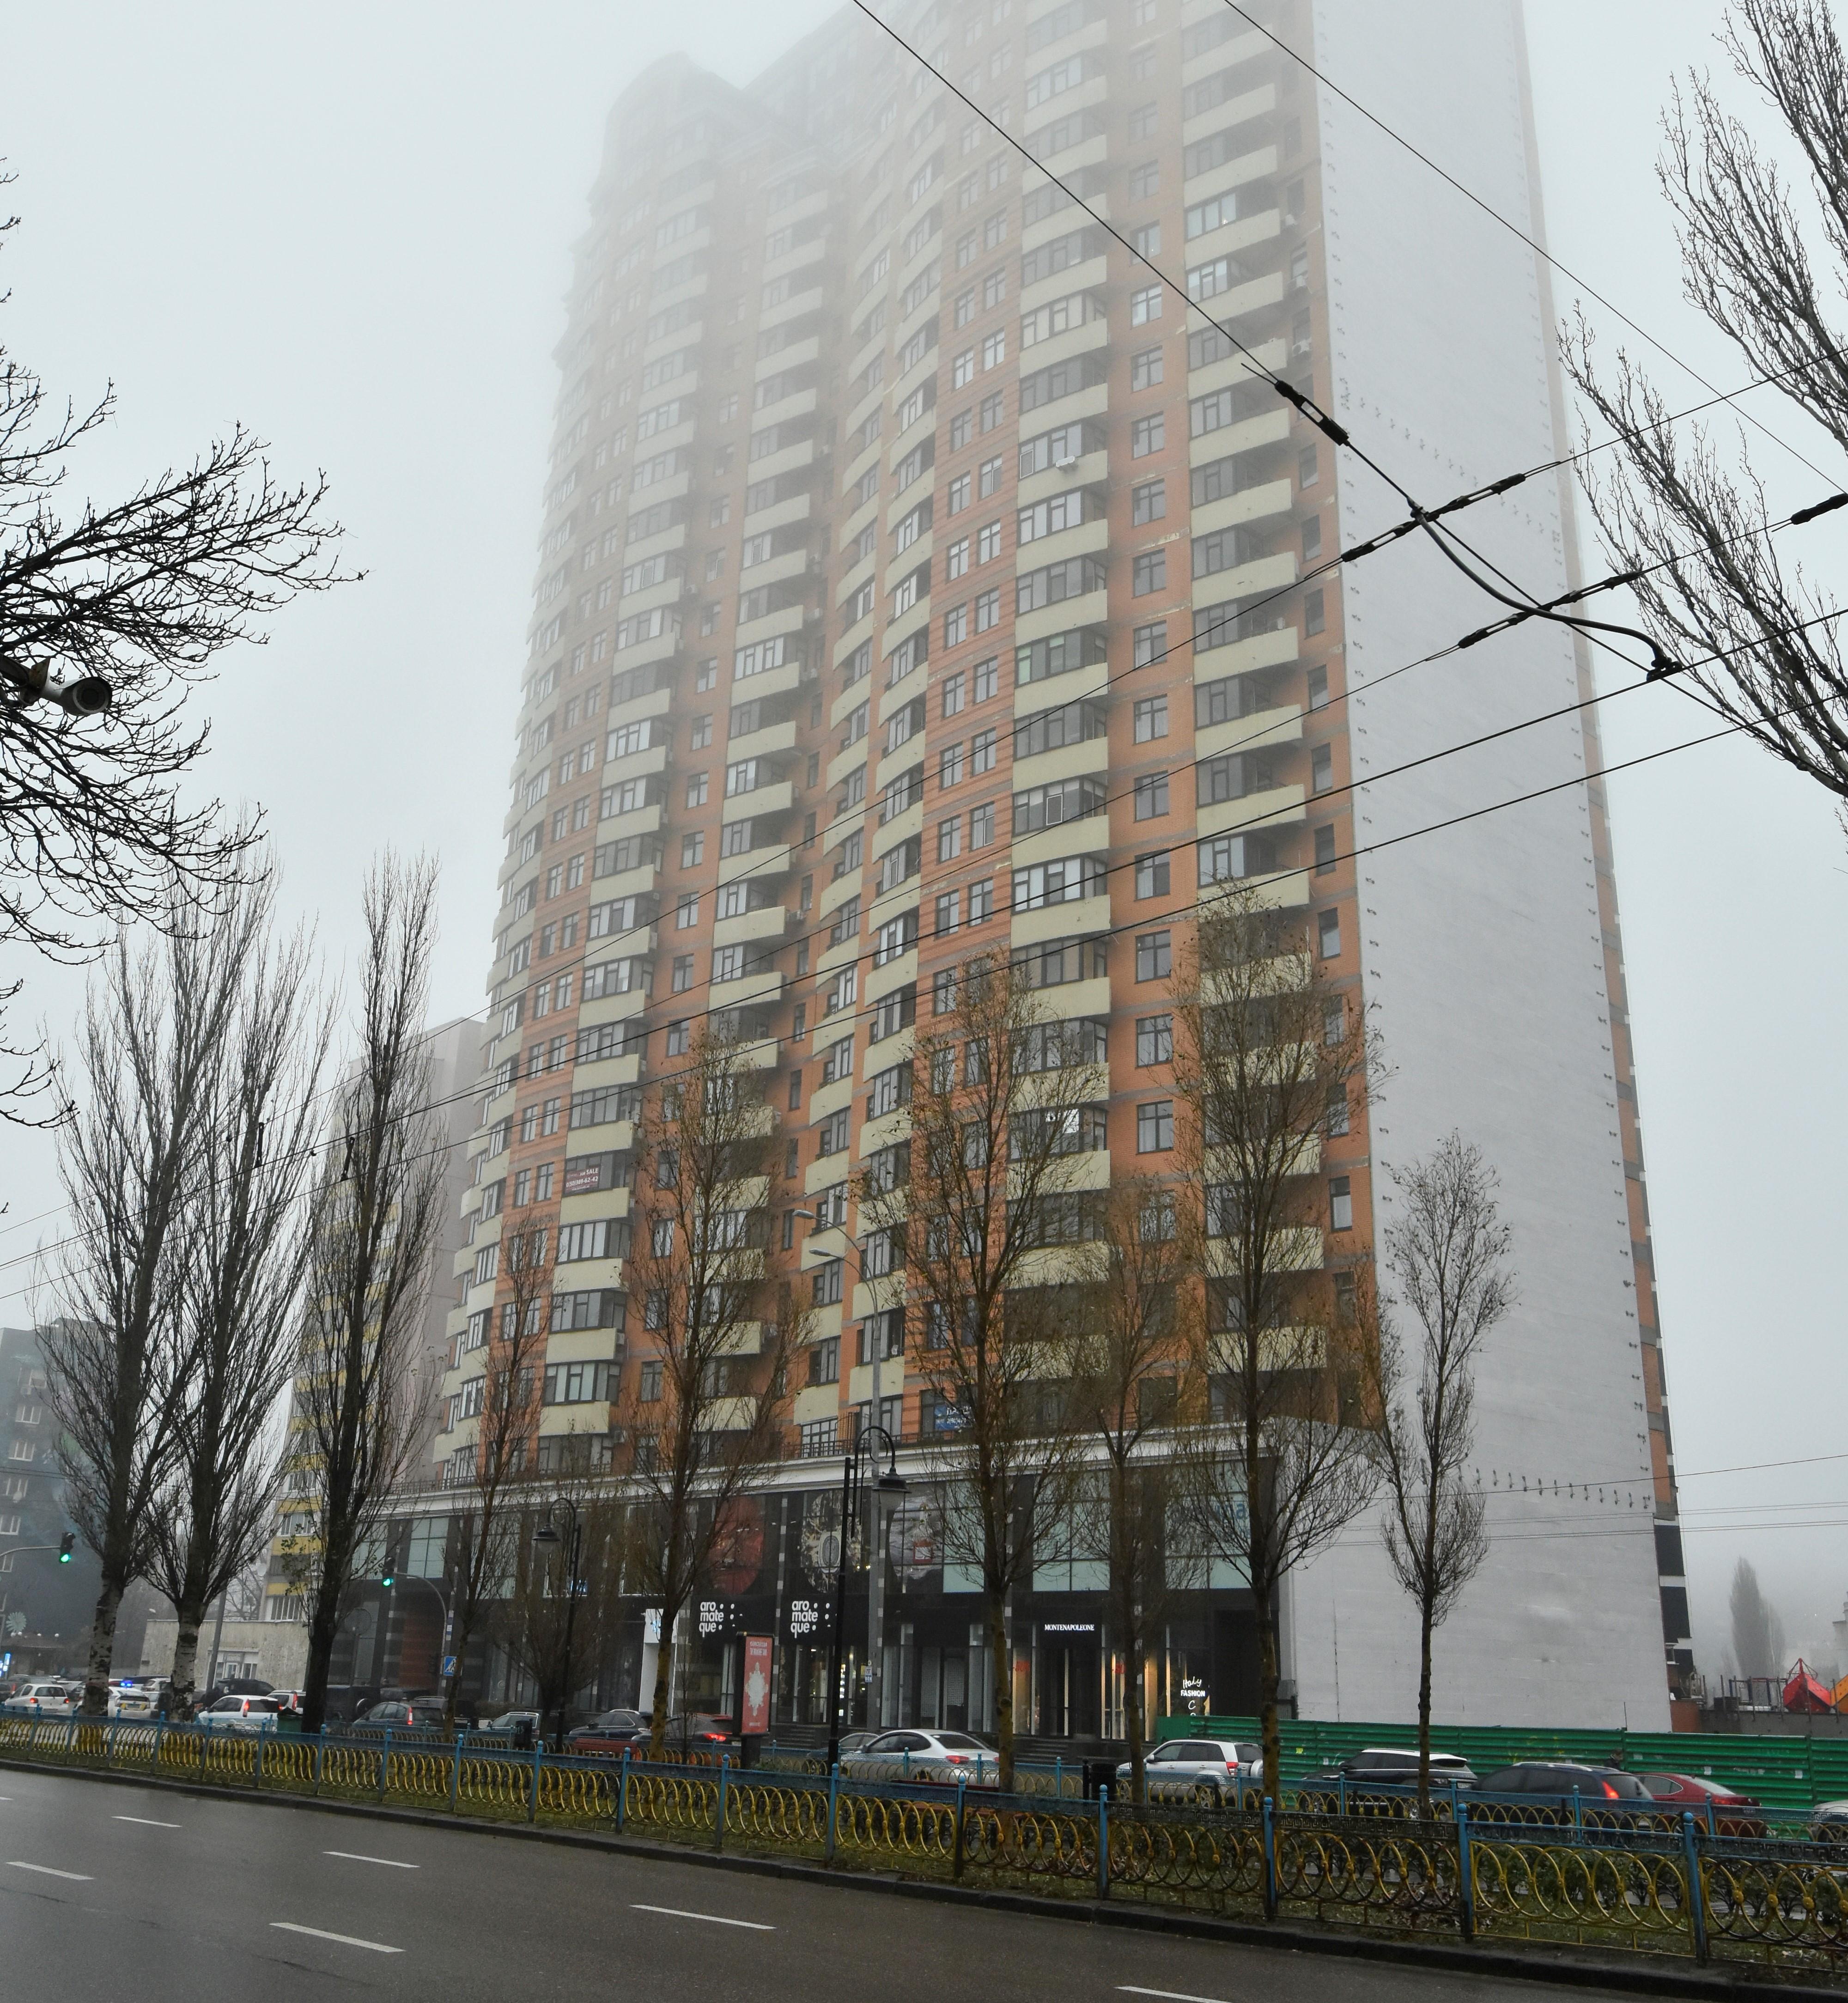 Высотка на бульваре Леси Украинки 7А. Фото: Аркадий Манн/Страна